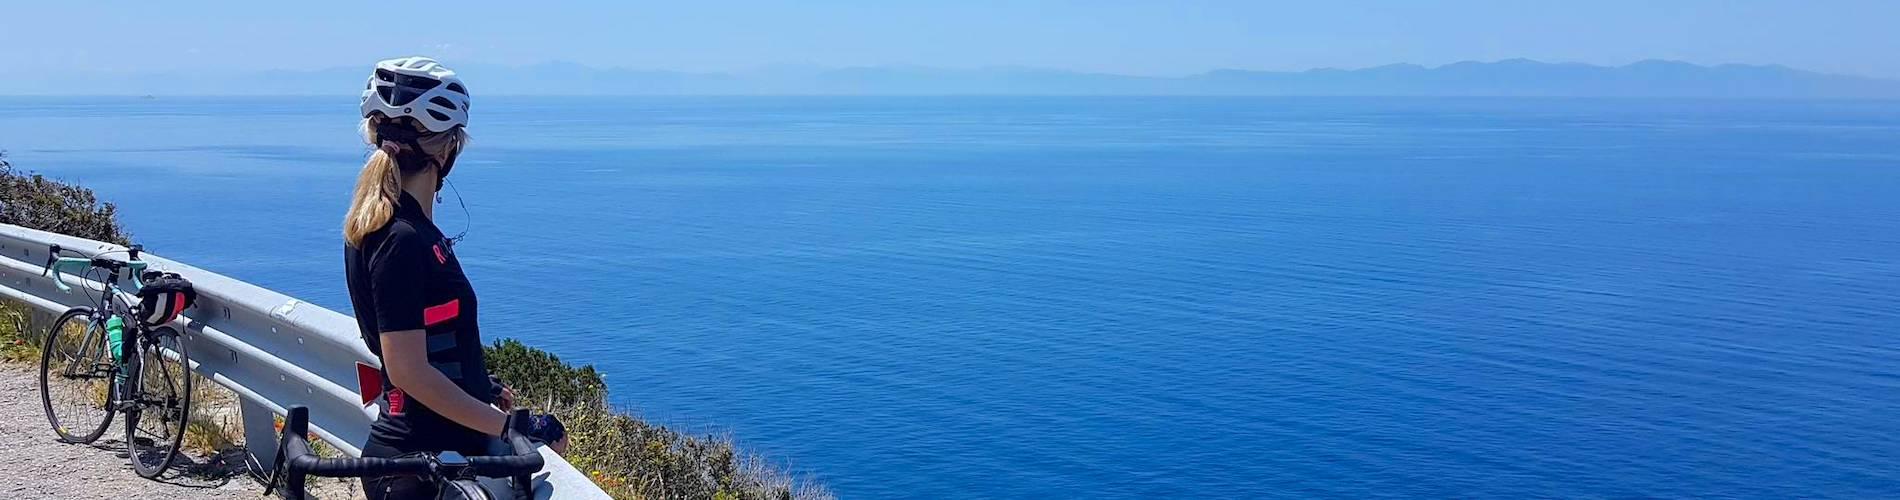 Isola d'Elba Ovest sx copertinajpeg